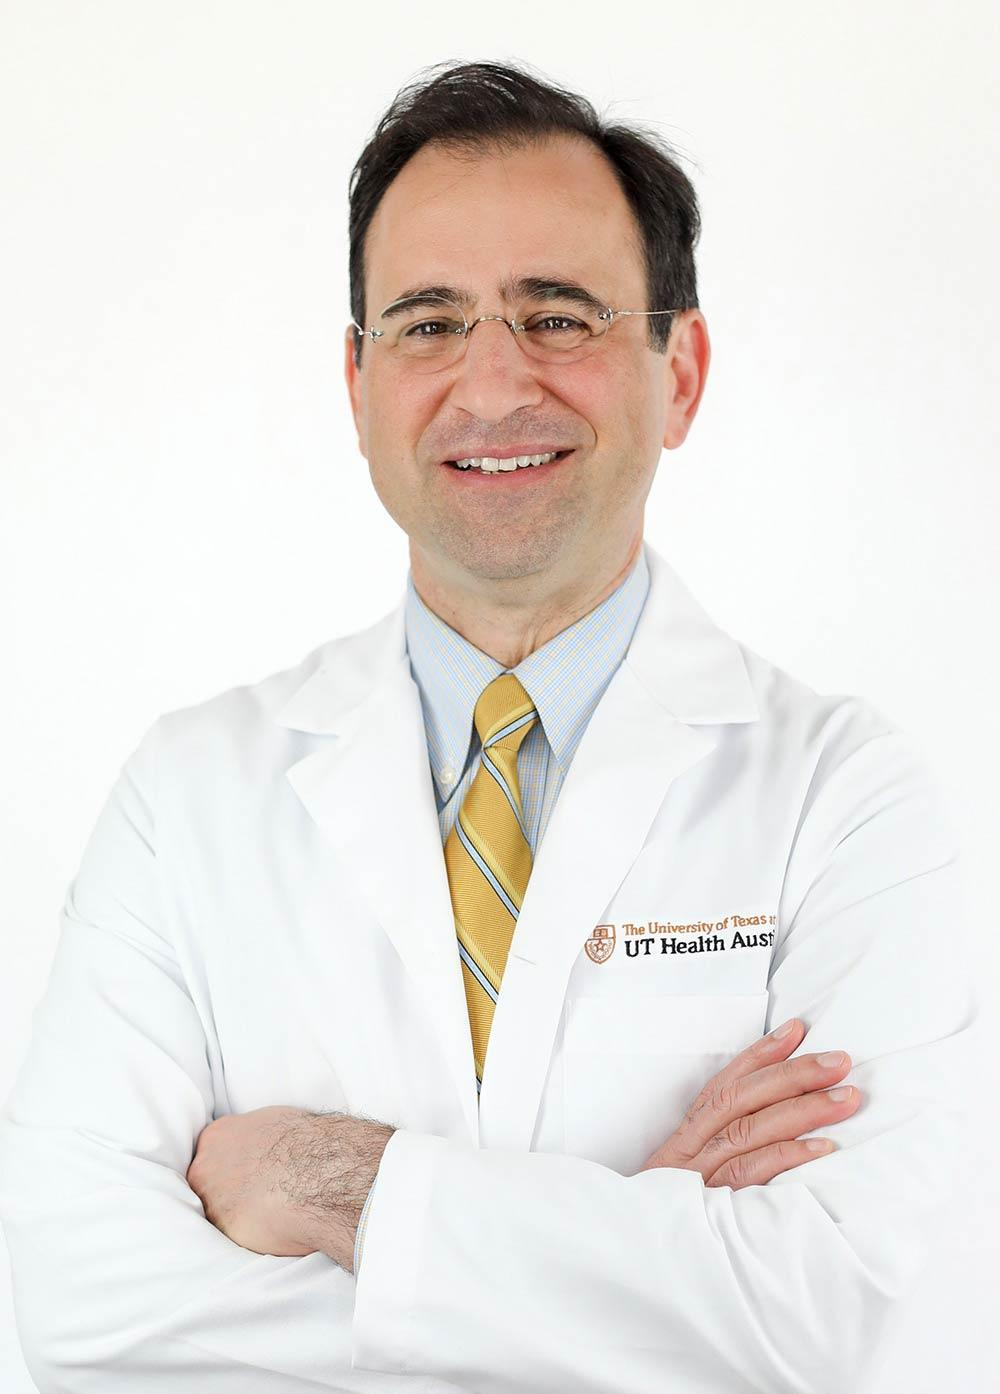 Headshot of David Paydarfar.